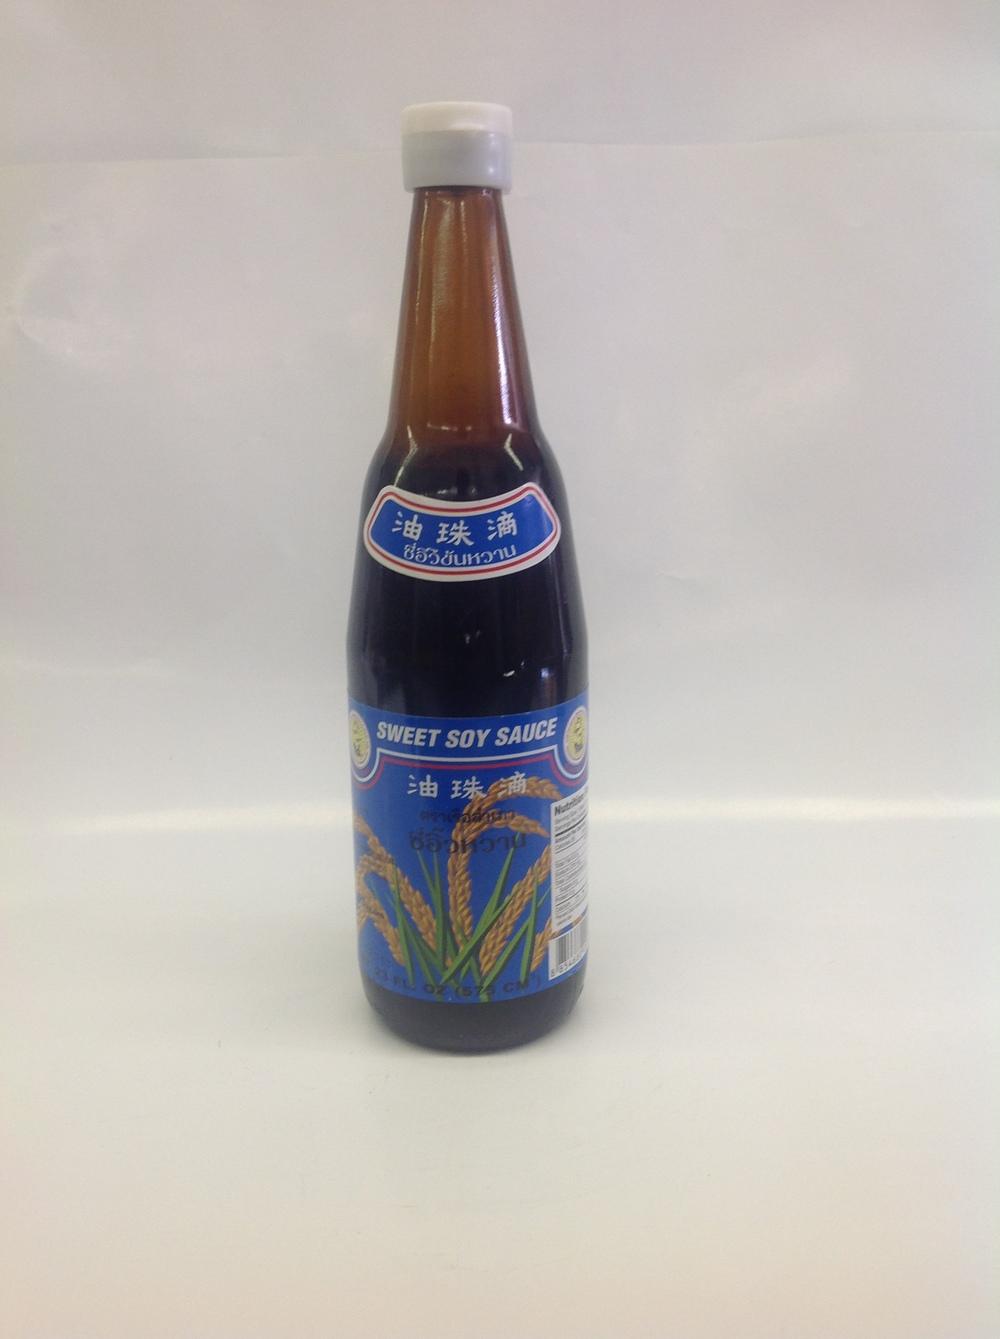 Sweet Soy Sauce   Sumpao Boat   SA17190A 12x24 oz